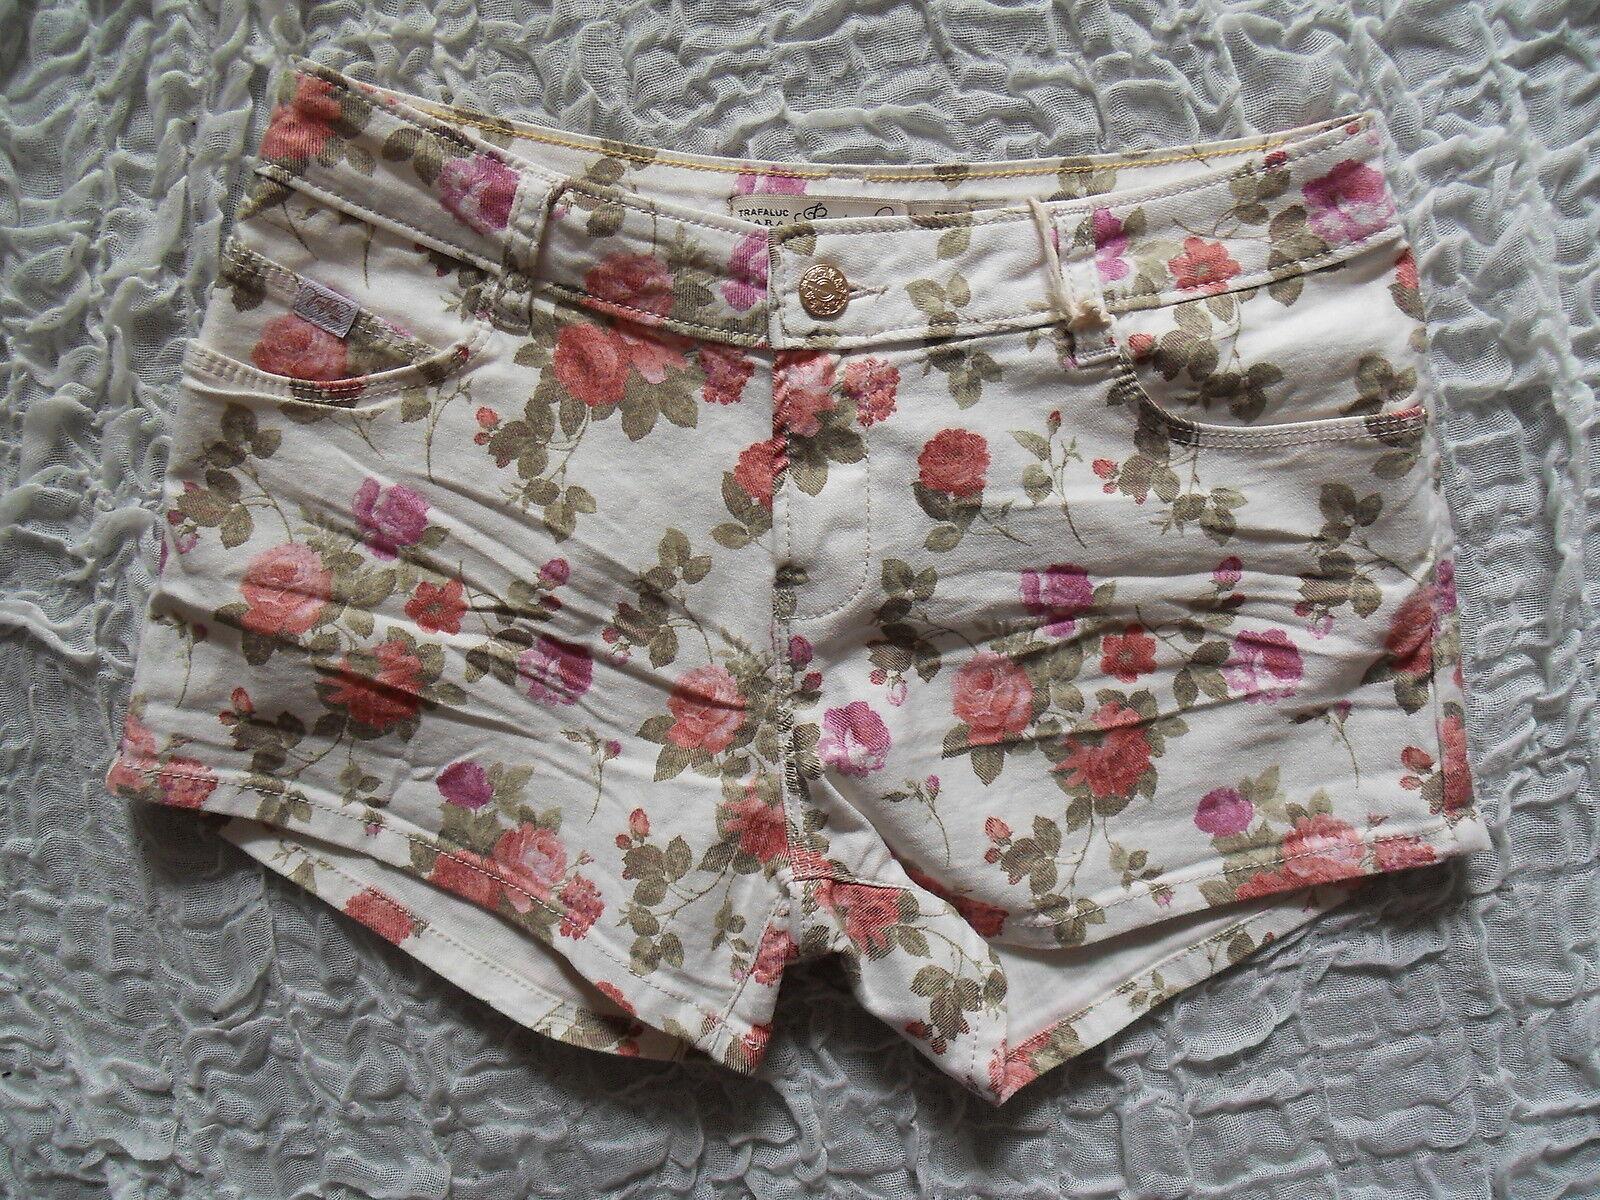 ZARA TRAFALUC off white pink floral print denim short shorts size 10 BNWT